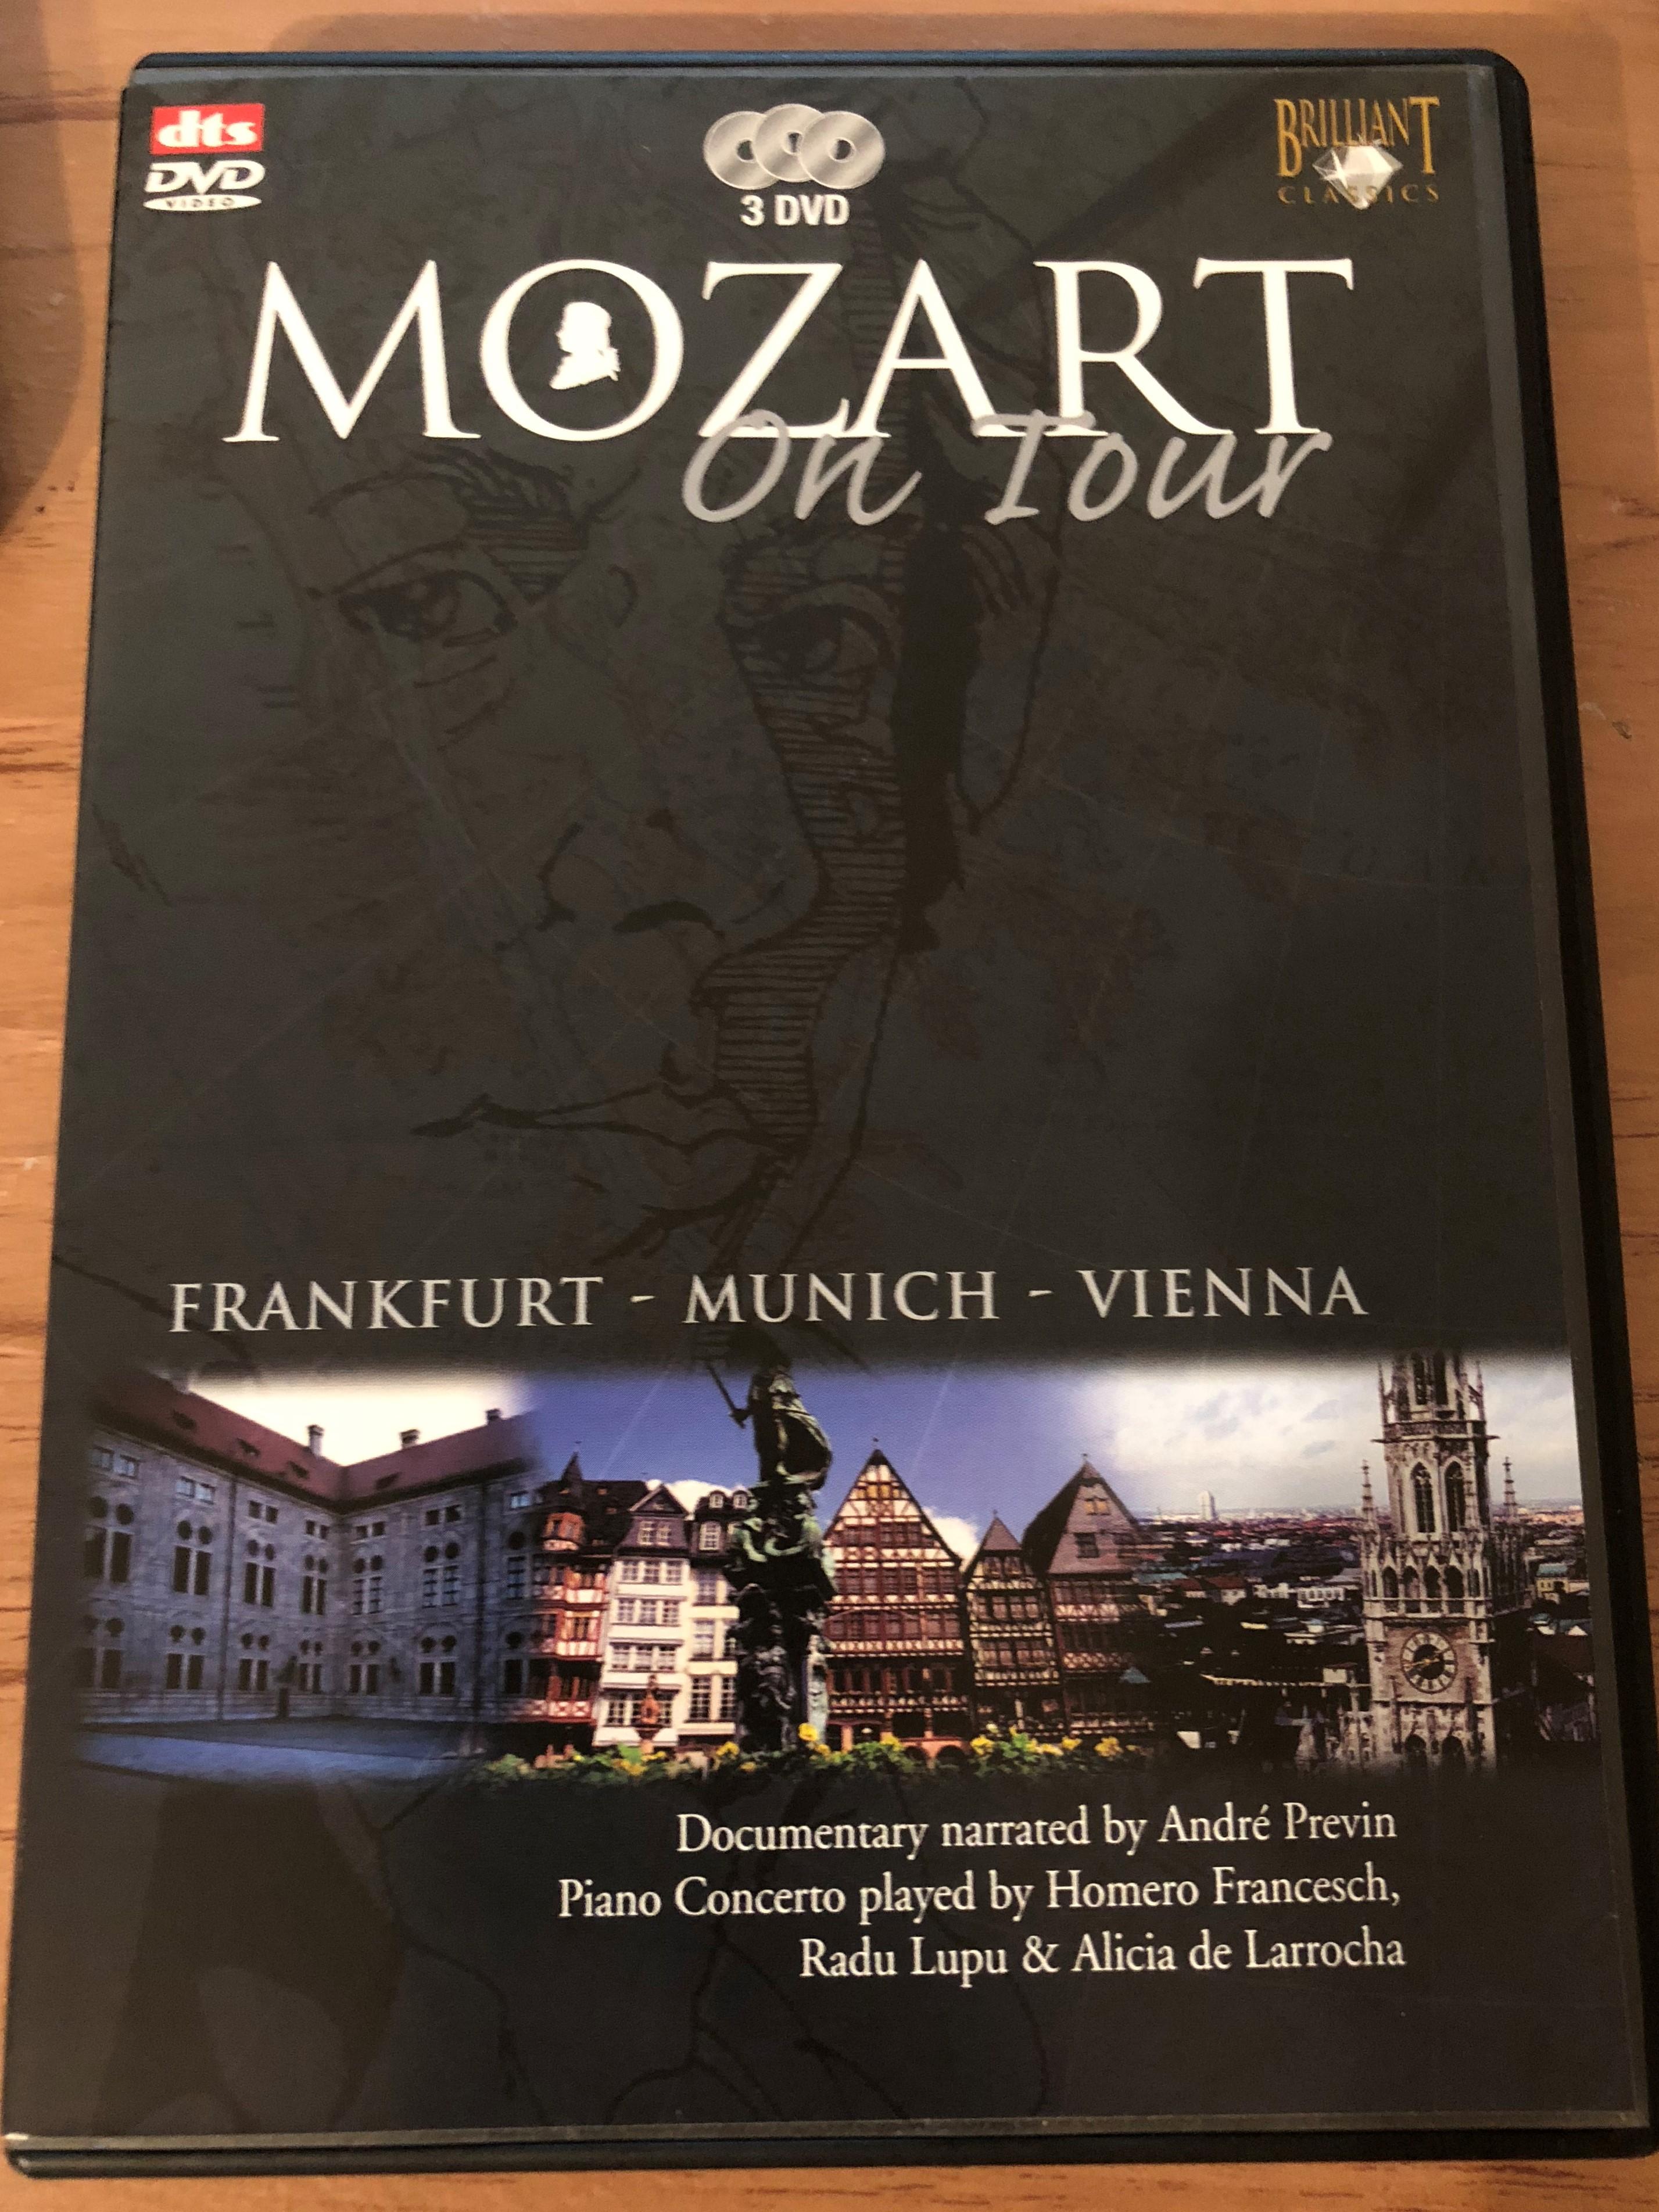 mozart-on-tour-dvd-frankfurt-munich-vienna-documentary-narrated-by-andr-previn-piano-concerto-played-by-homero-francesch-radu-lupu-alicia-de-larrocha-3-dvd-1-.jpg